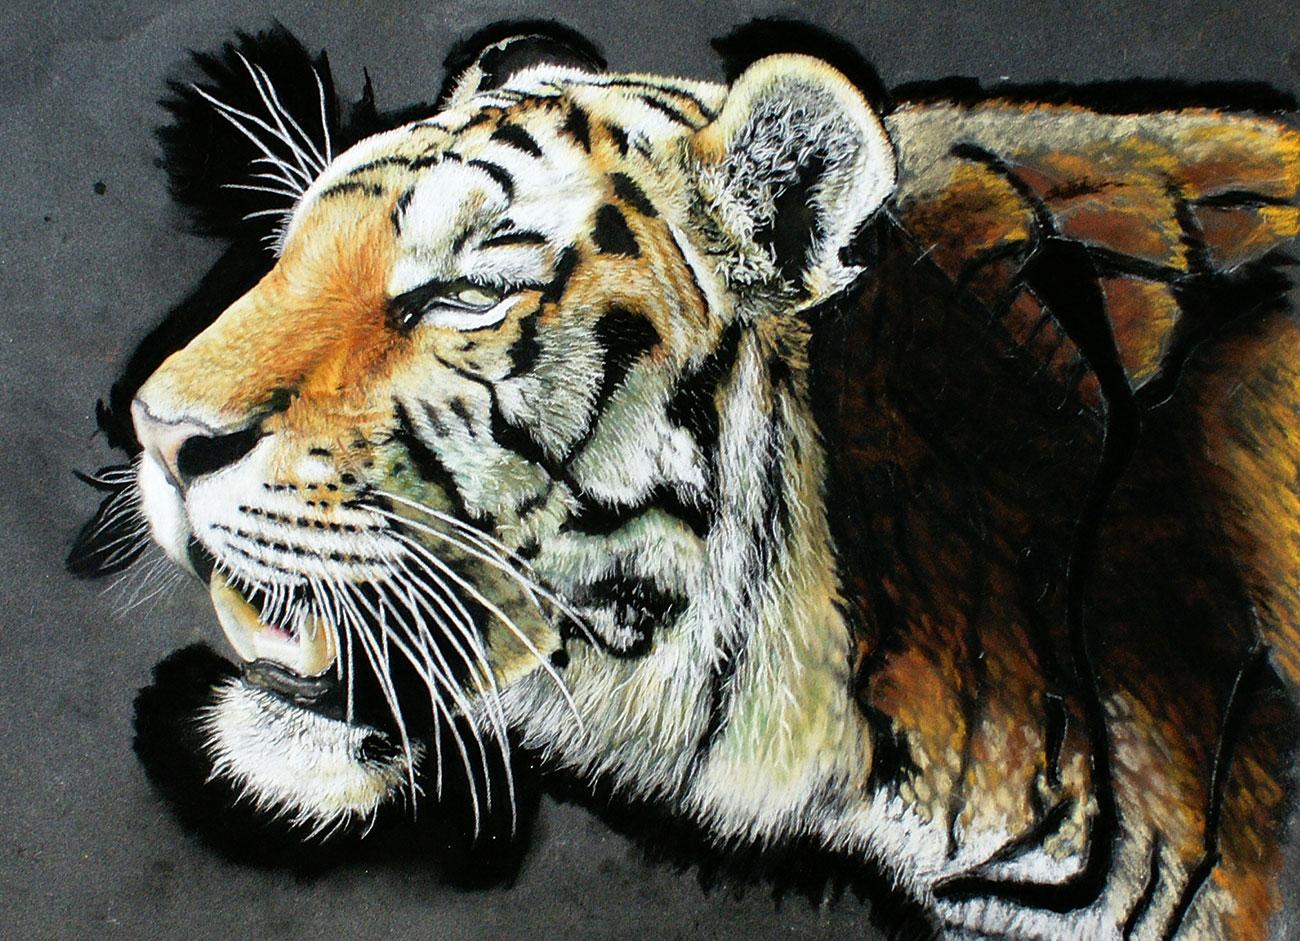 Tiger portrait with hard pastel sticks